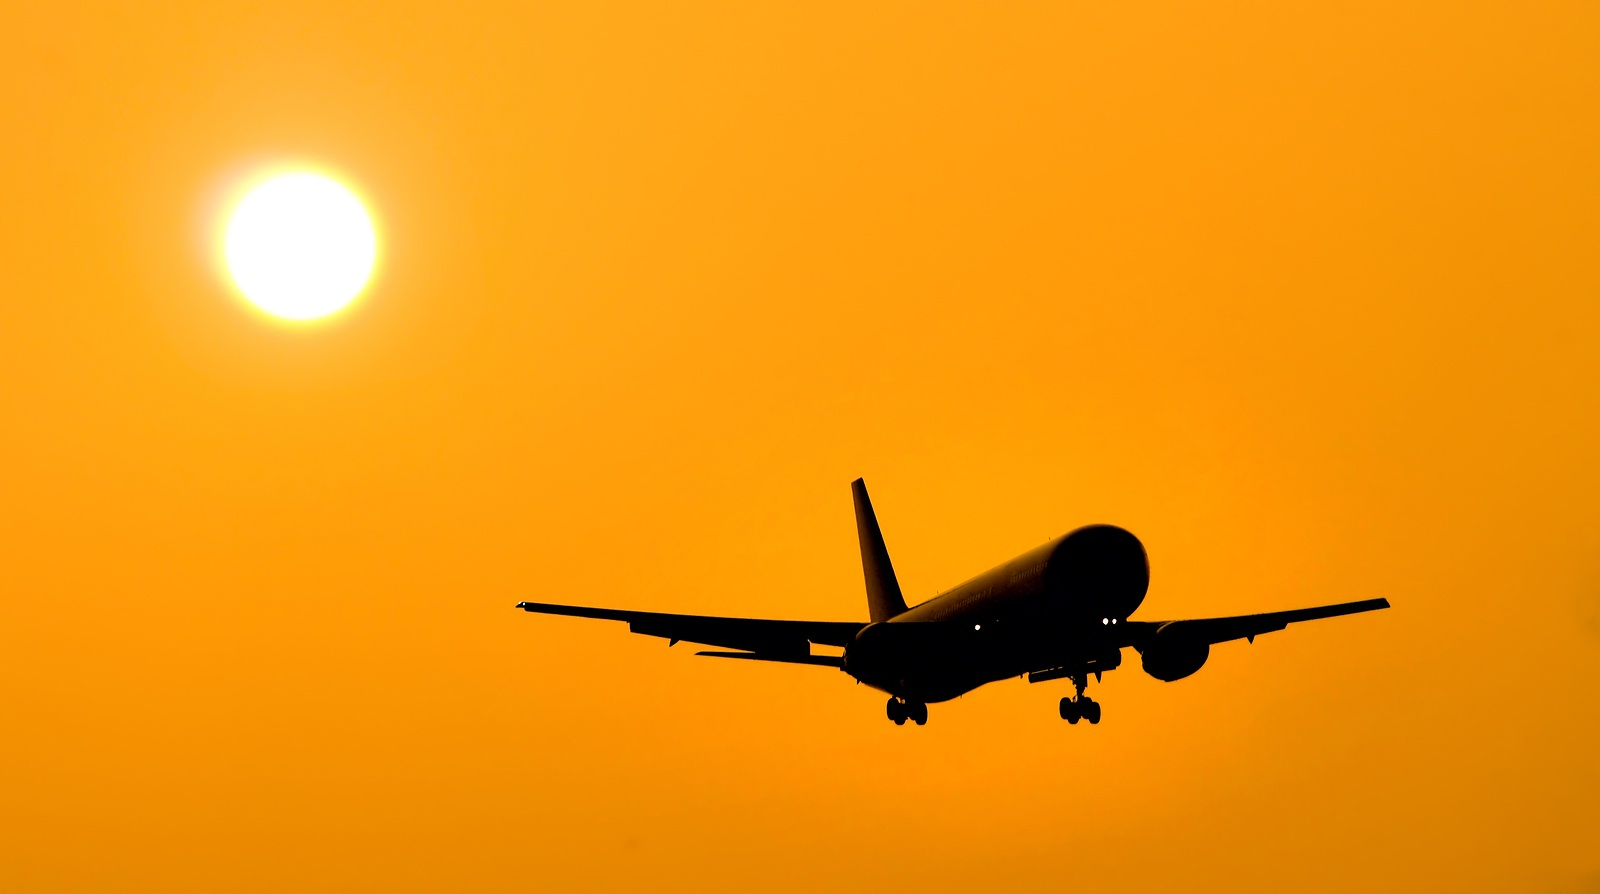 bigstockphoto_Aircraft_Landing_229370